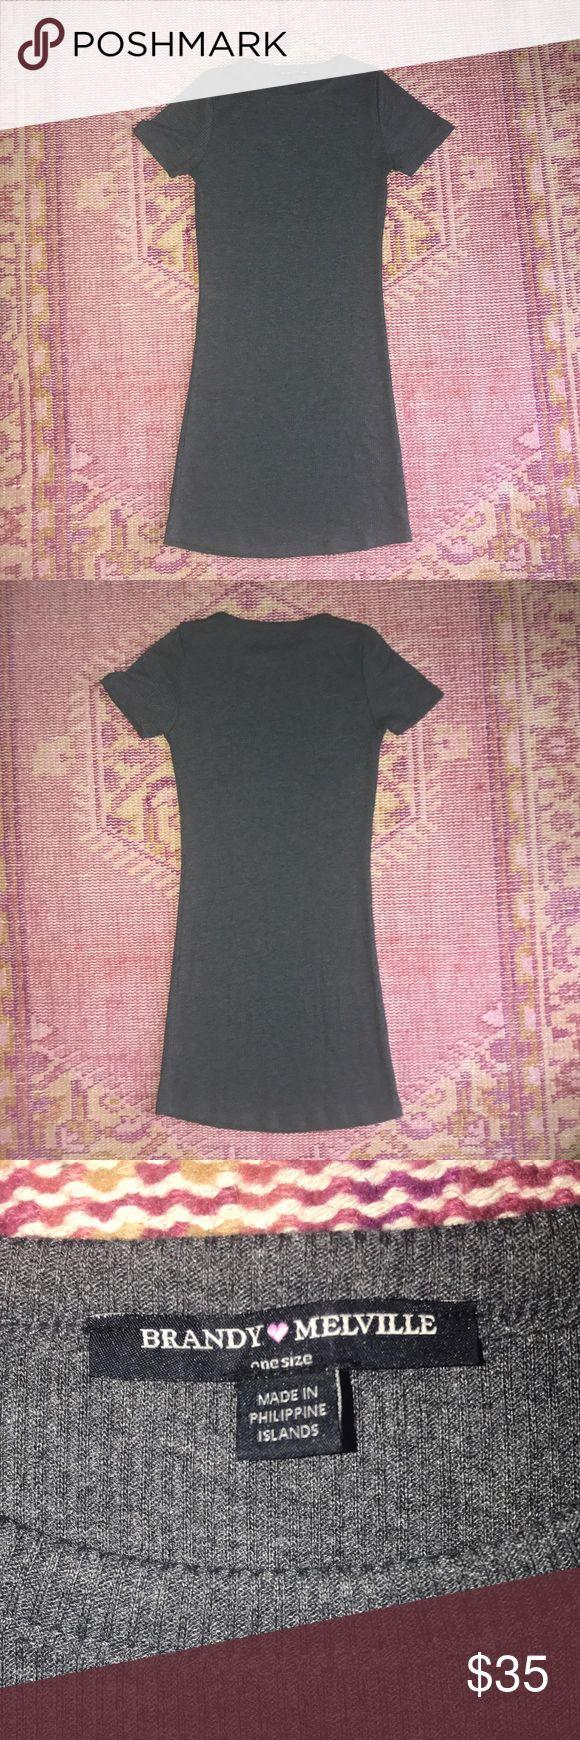 Grey bodycon dress Brandy Melville grey (thick-nice material) bodycon dress✨ NEW- never worn Brandy Melville Dresses Mini